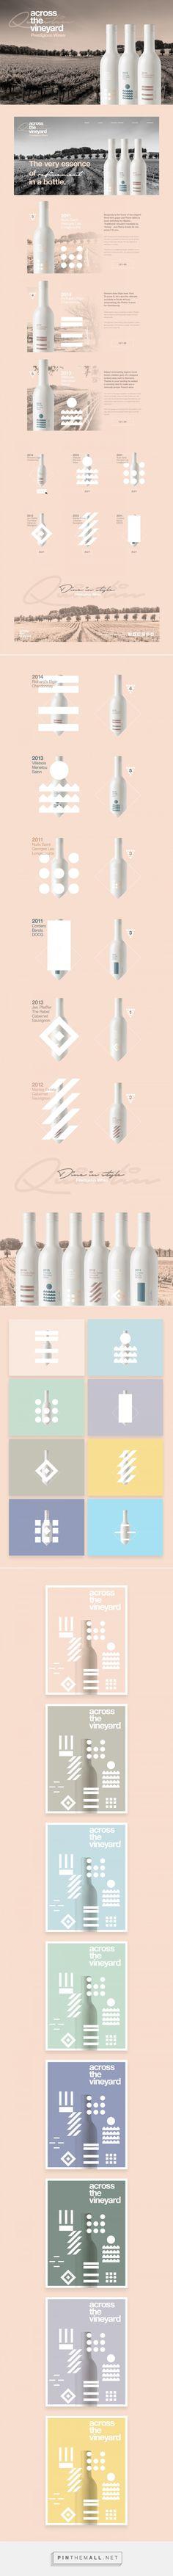 Across the Vineyard Wine Branding and Packaging by Studio-JQ | Fivestar Branding – Design and Branding Agency & Inspiration Gallery